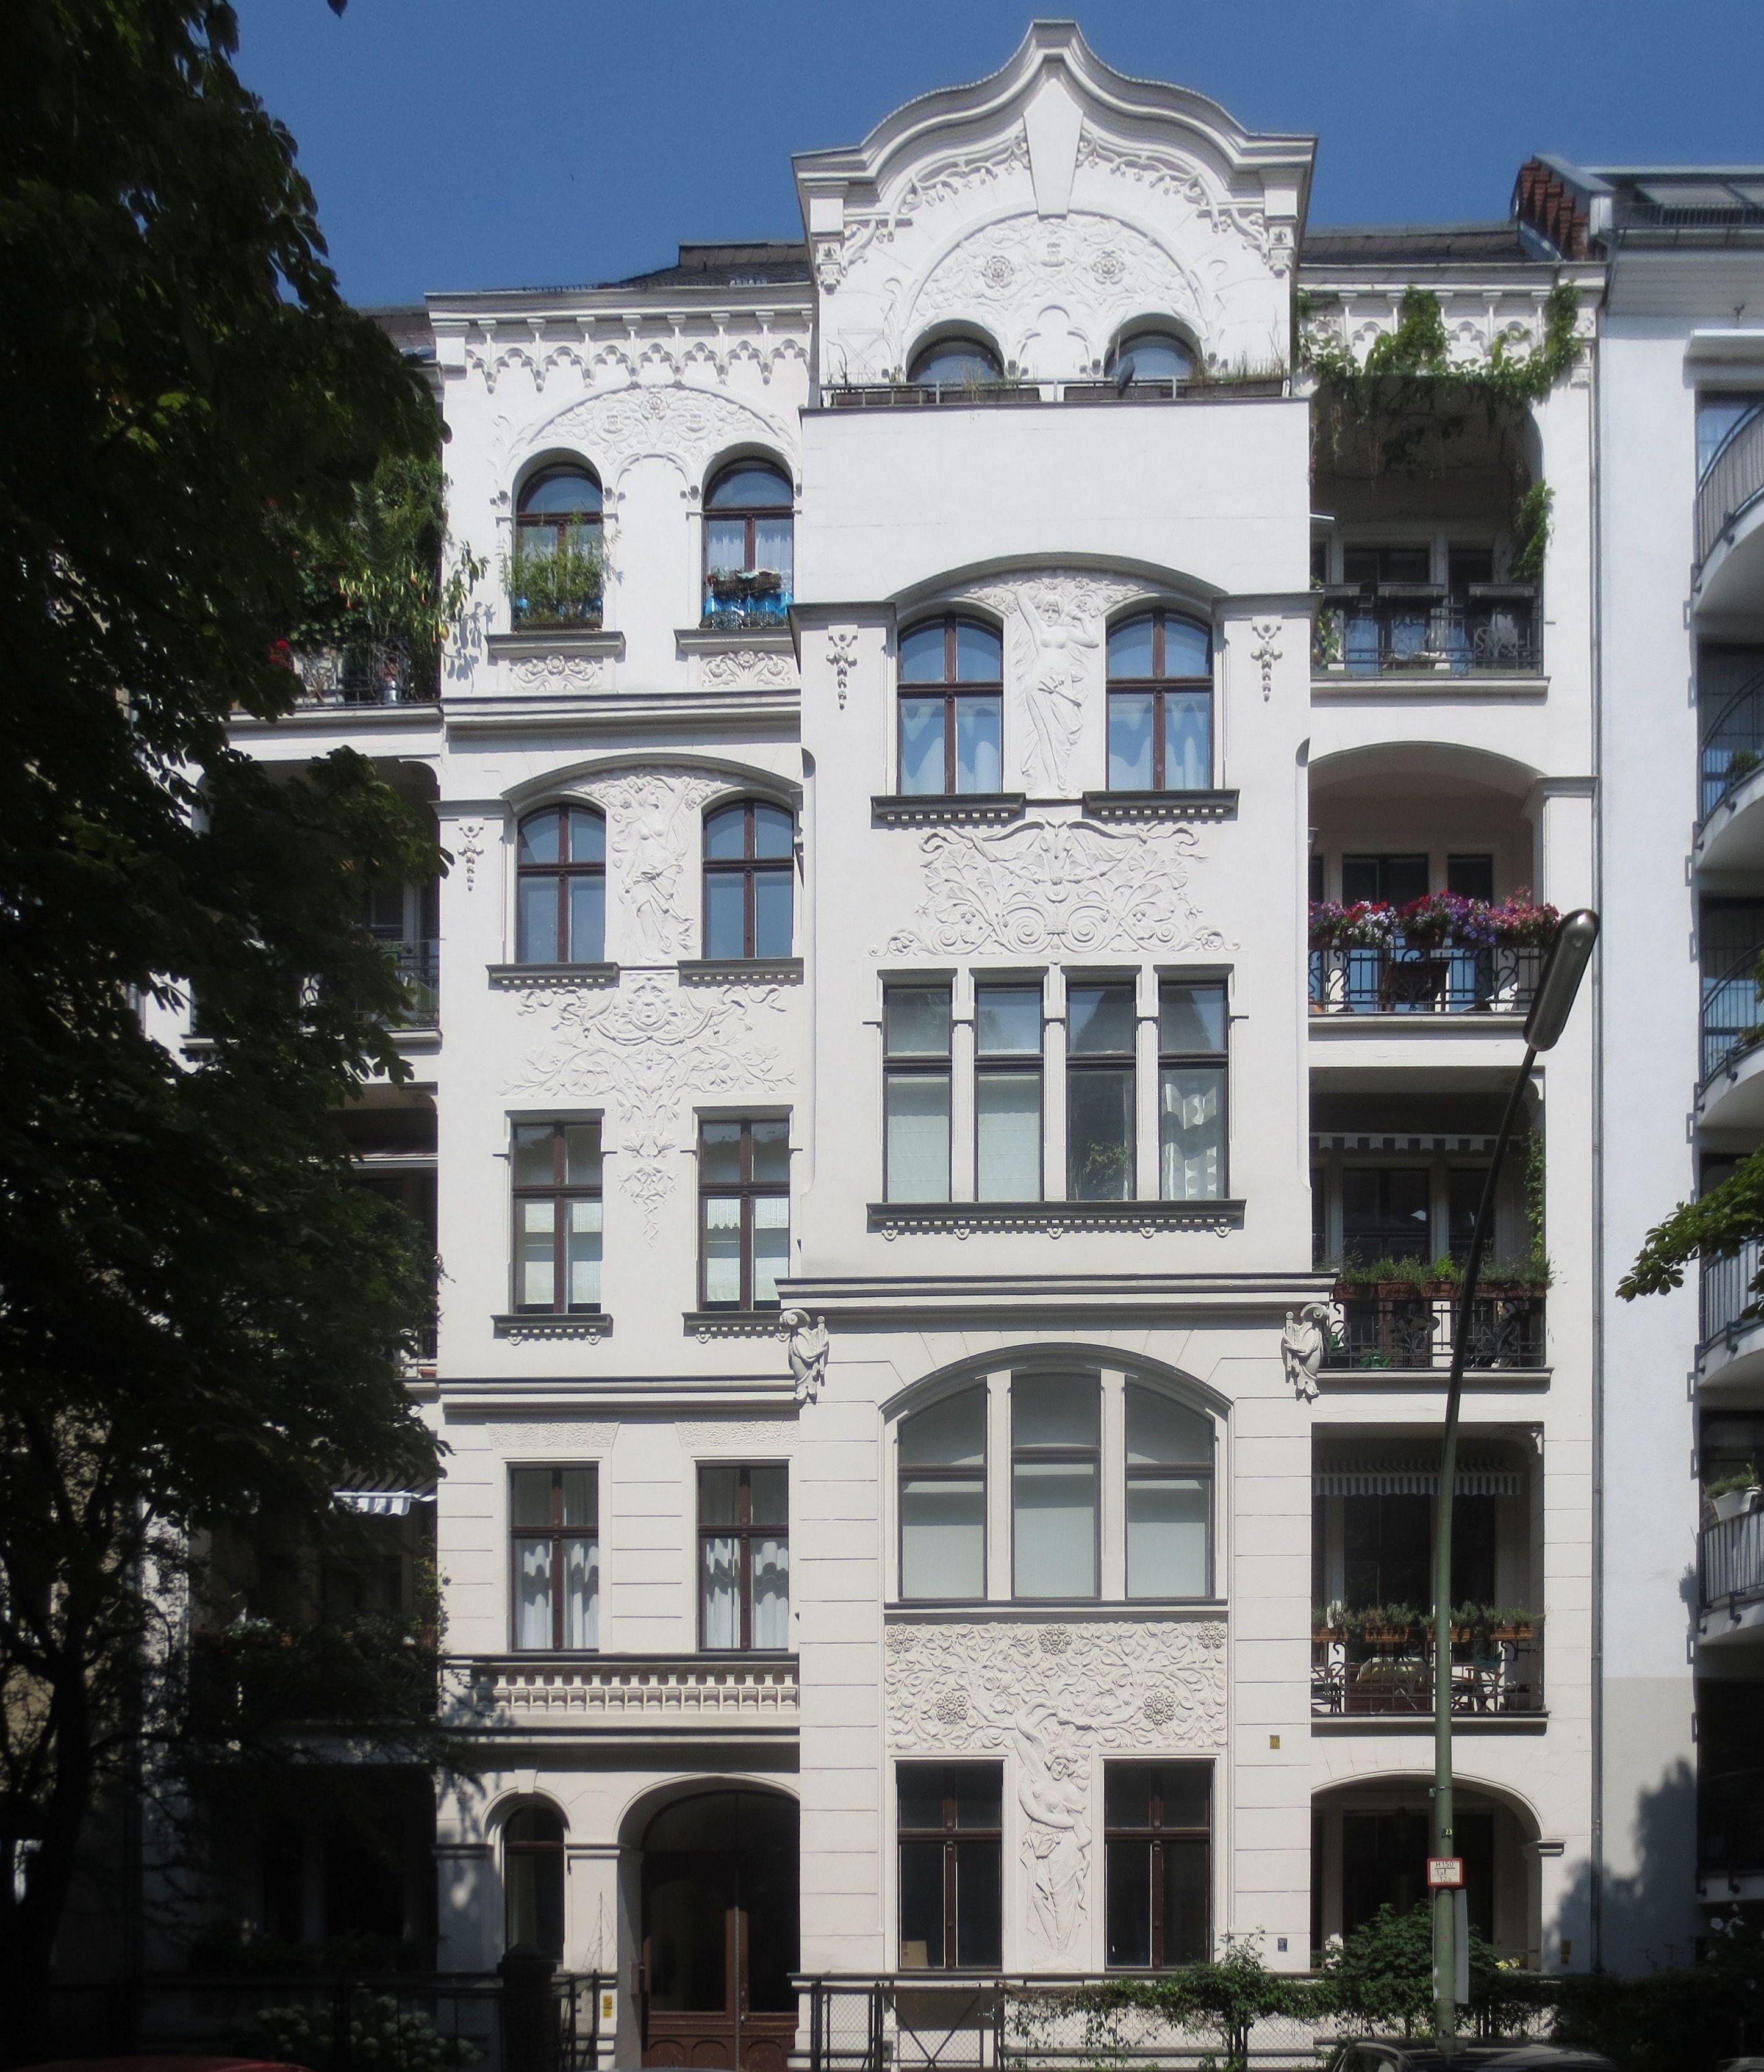 file berlin schoeneberg luitpoldstrasse 3 wikimedia commons. Black Bedroom Furniture Sets. Home Design Ideas